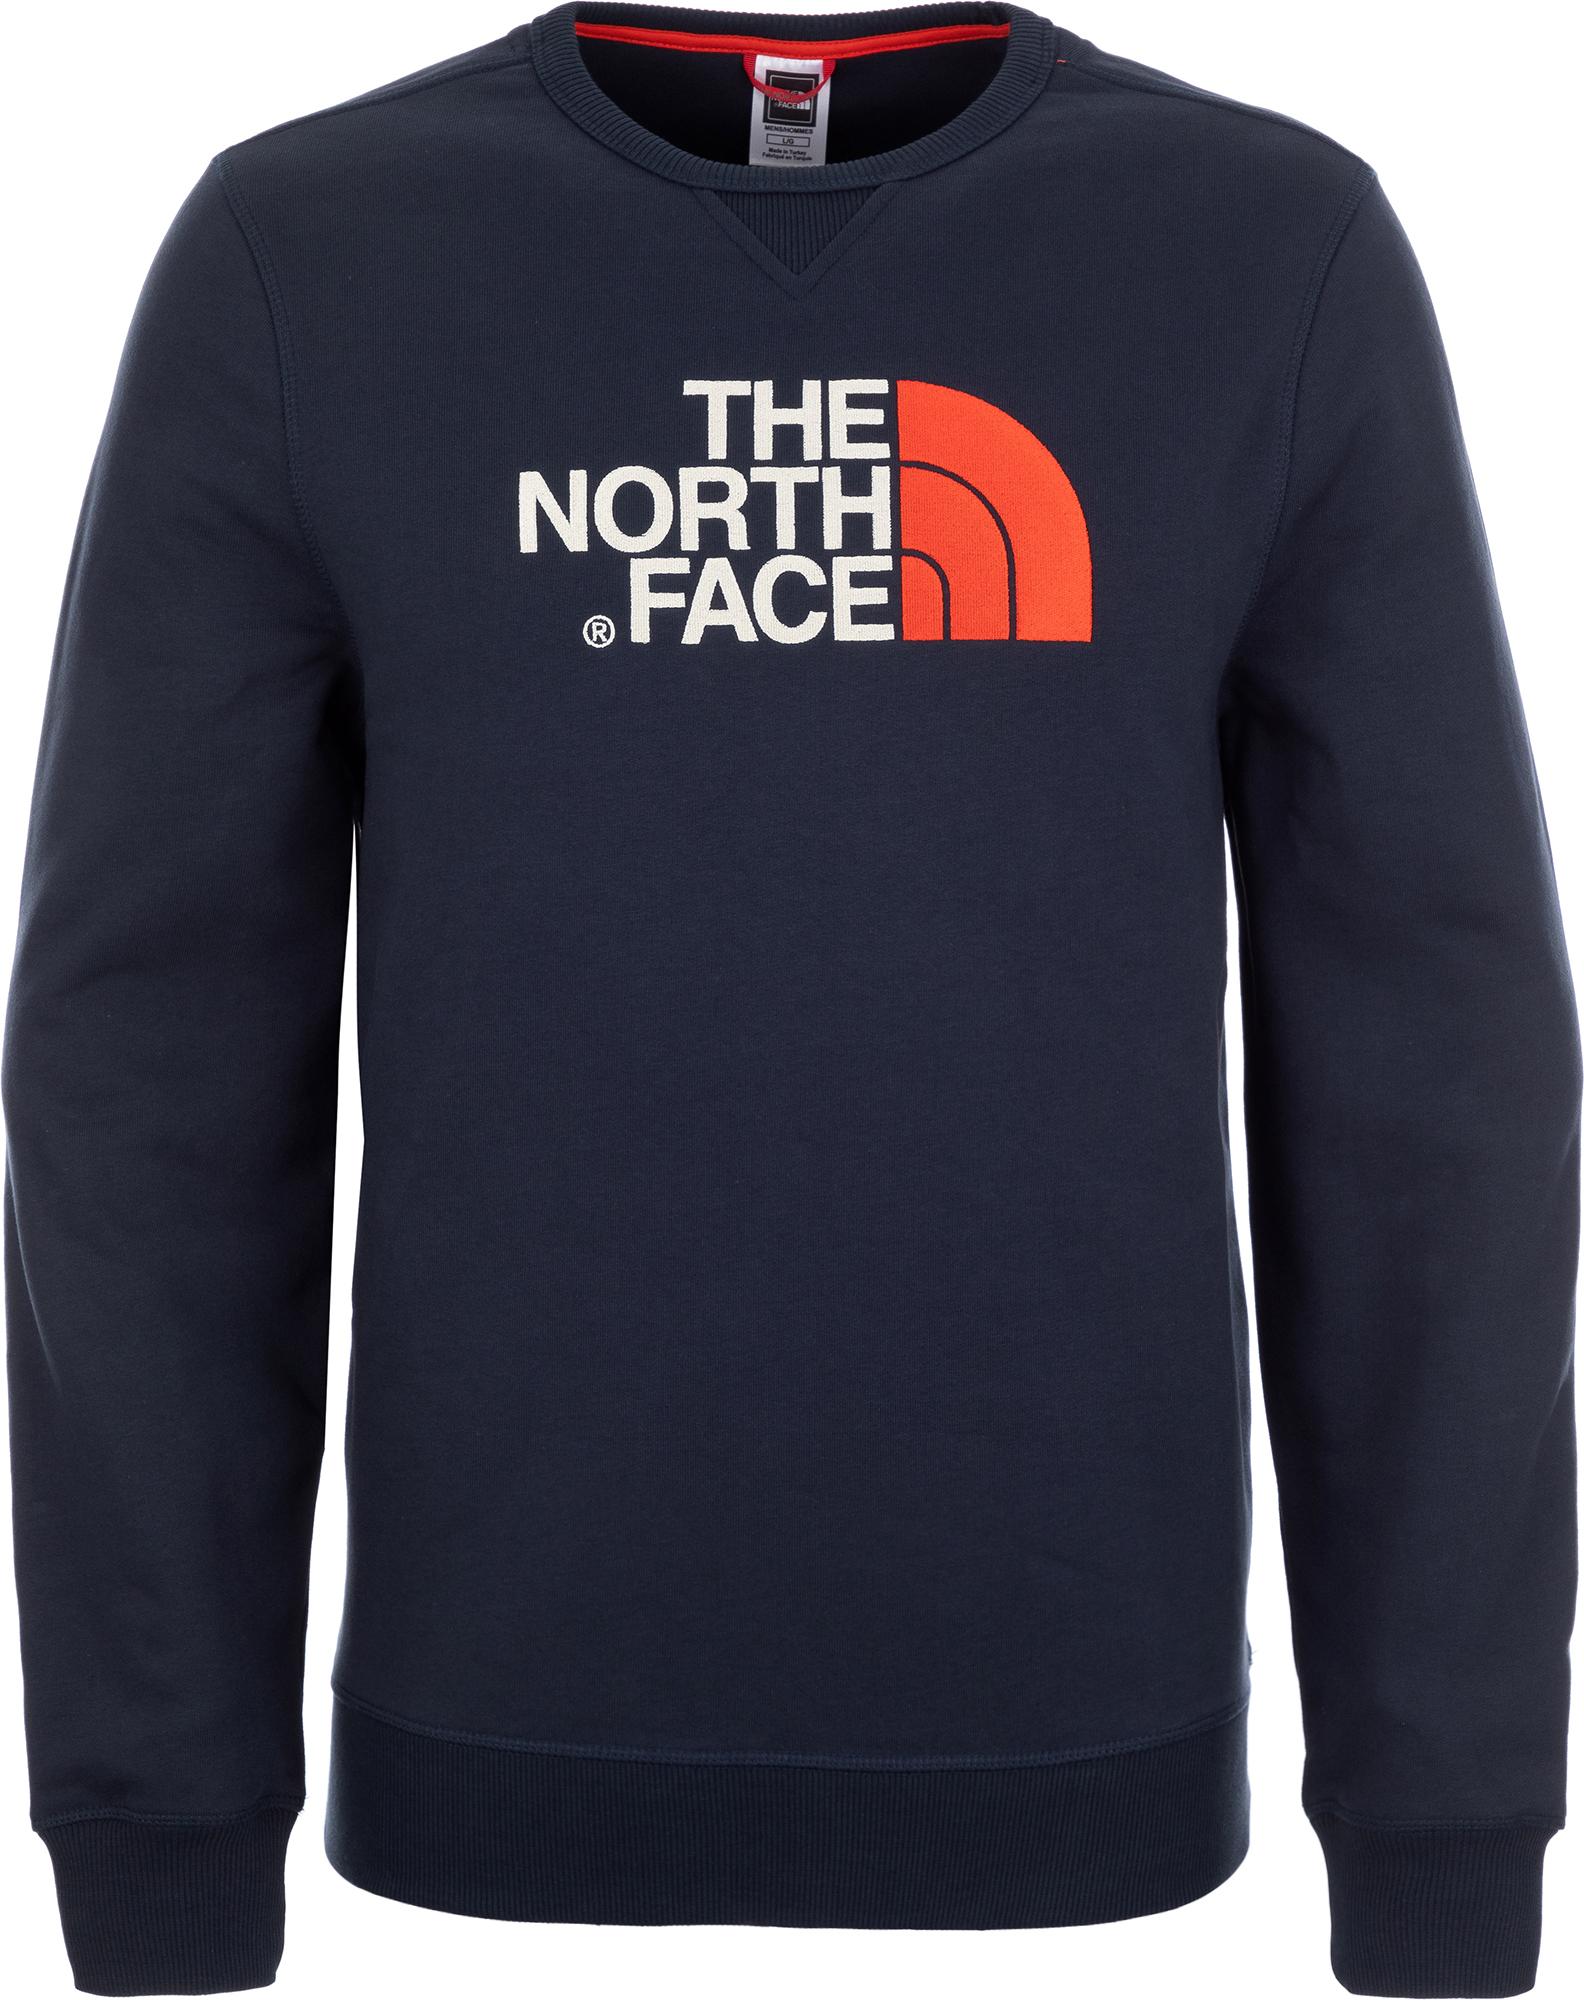 The North Face Джемпер мужской The North Face Drew Peak Crew, размер 52 цена и фото